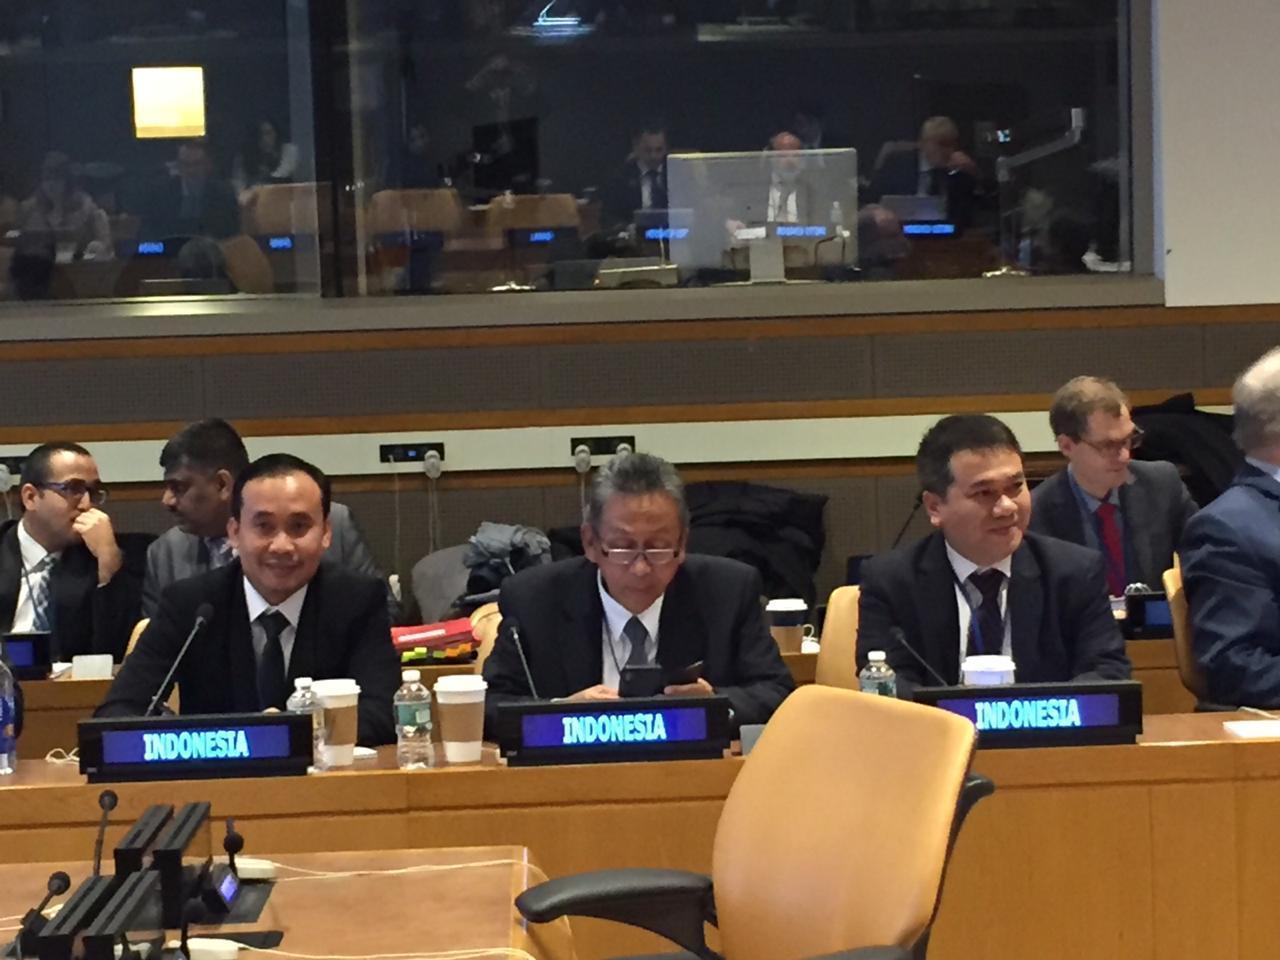 Ketua BPK Hadiri Sidang Tahunan Anggota Panel Pemeriksa Eksternal PBB Ke – 59